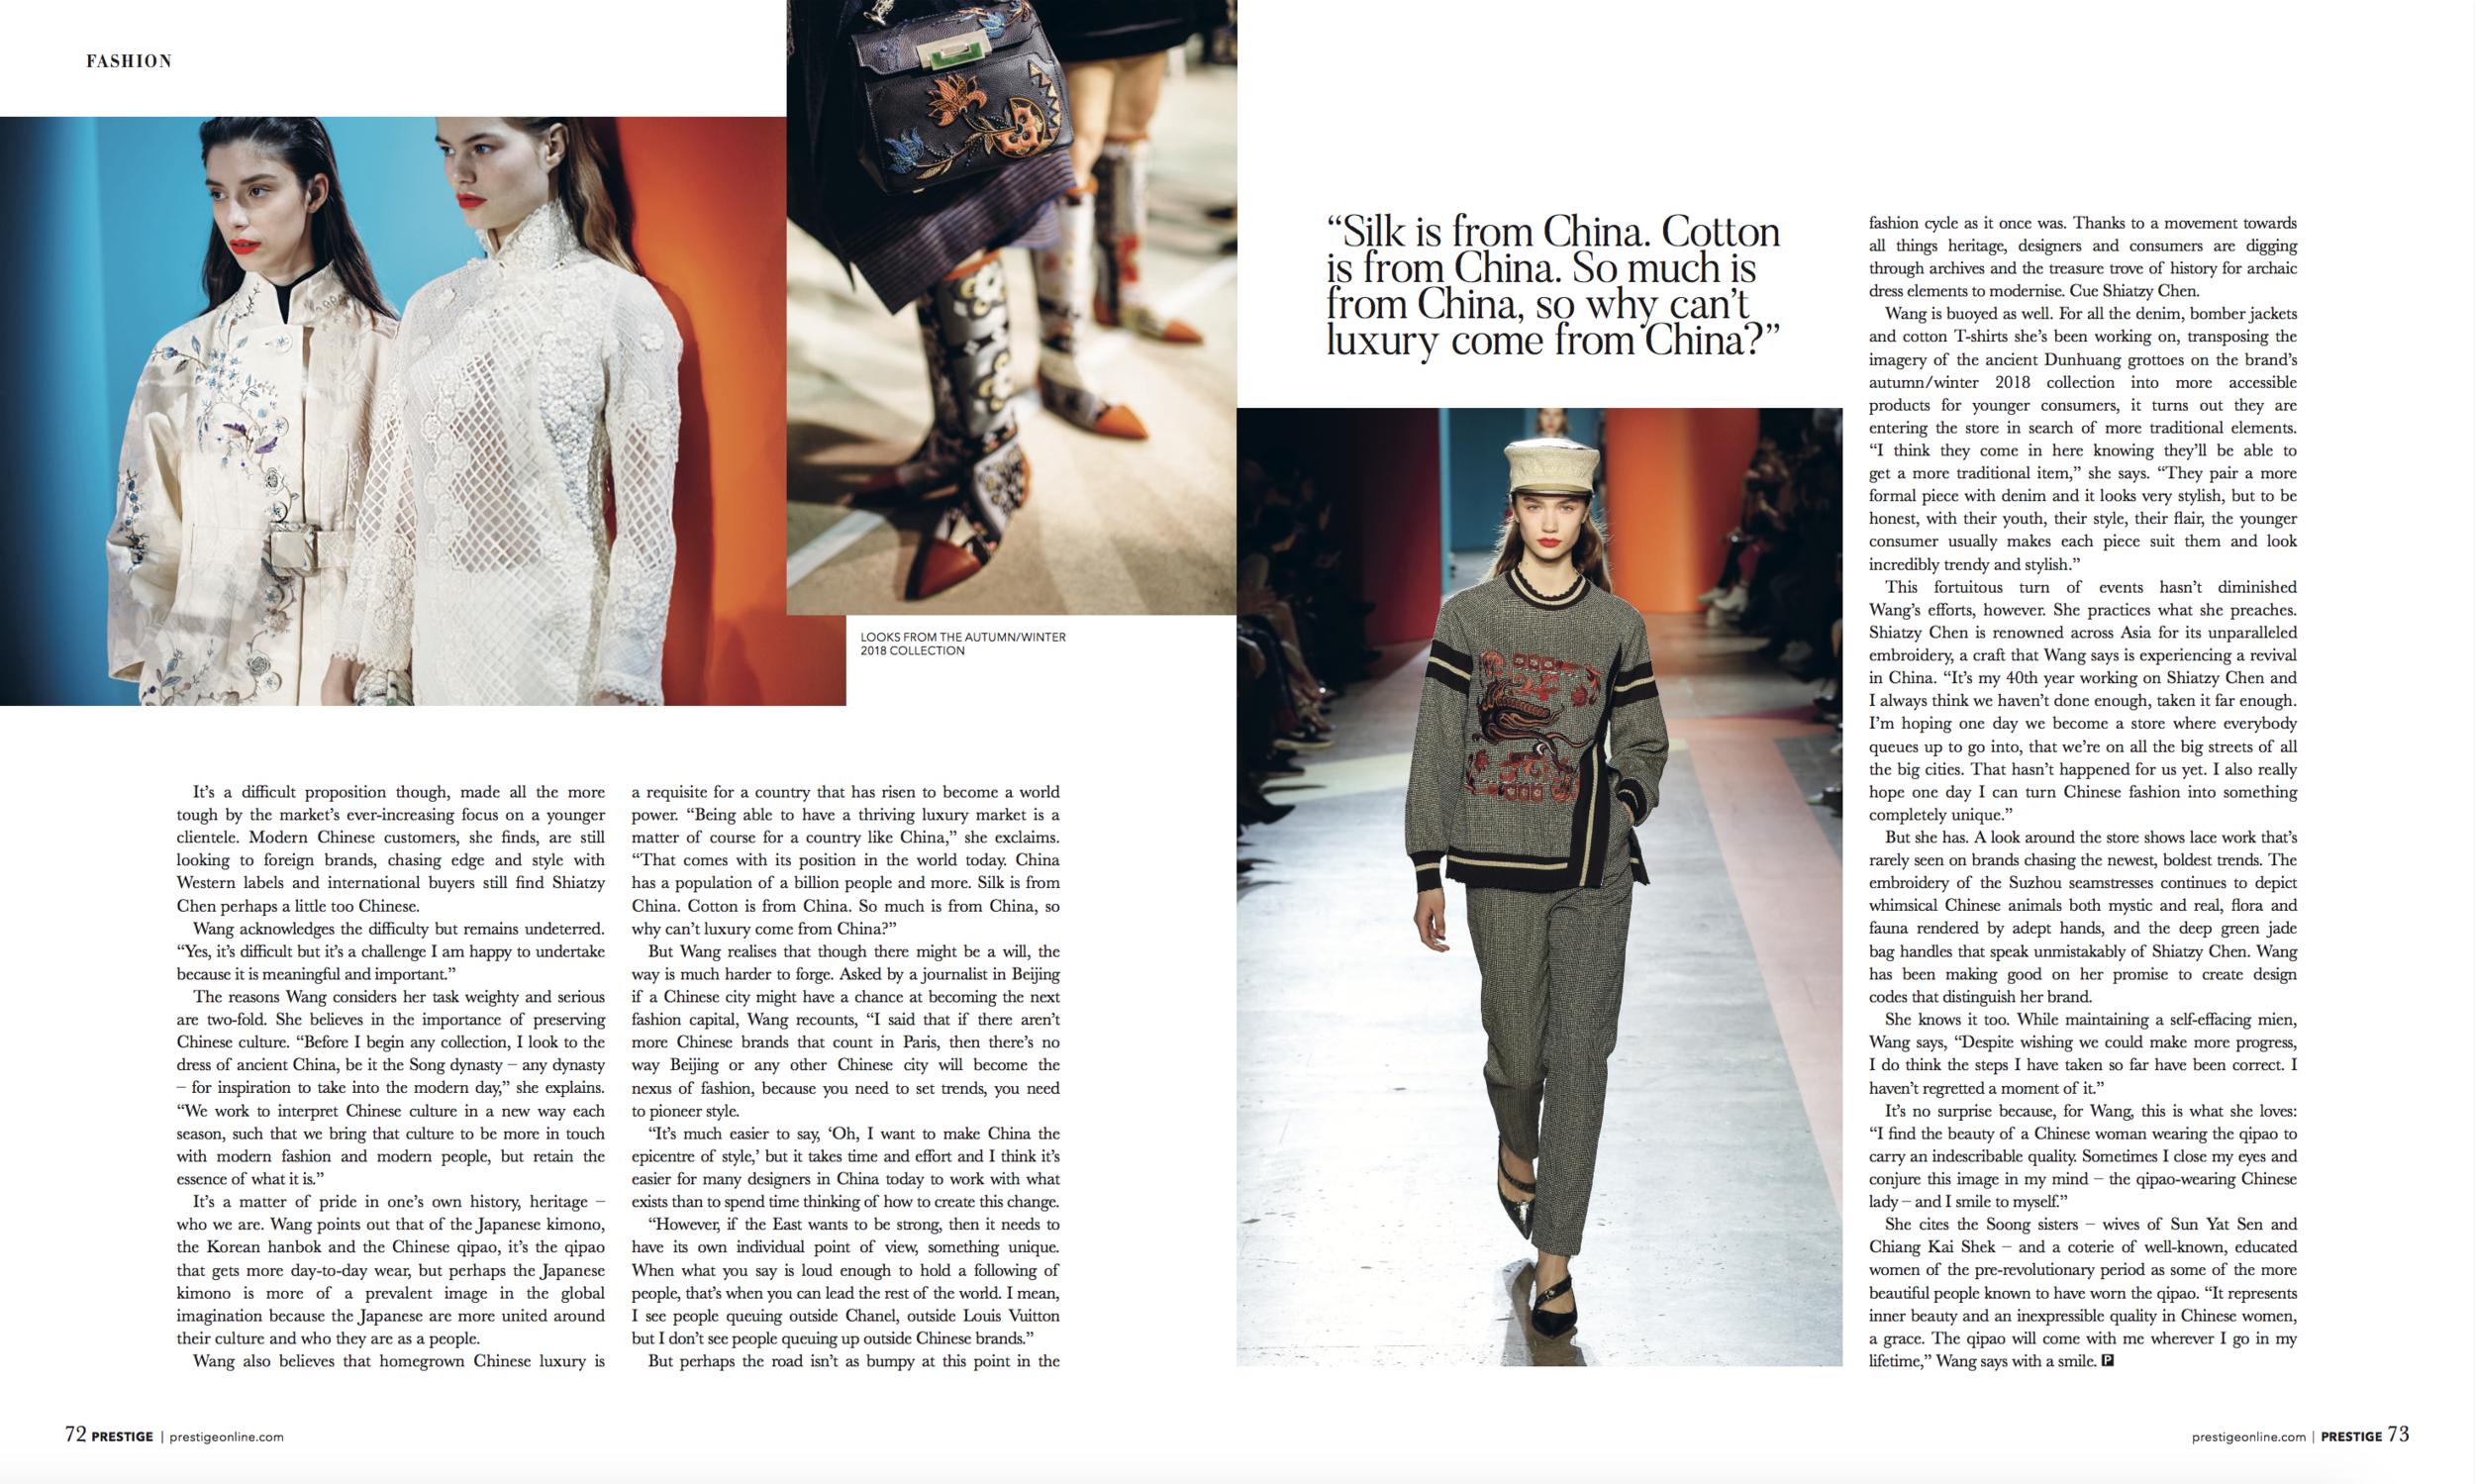 Shiatzy Chen Zaneta Cheng Prestige Interview 2:2.png